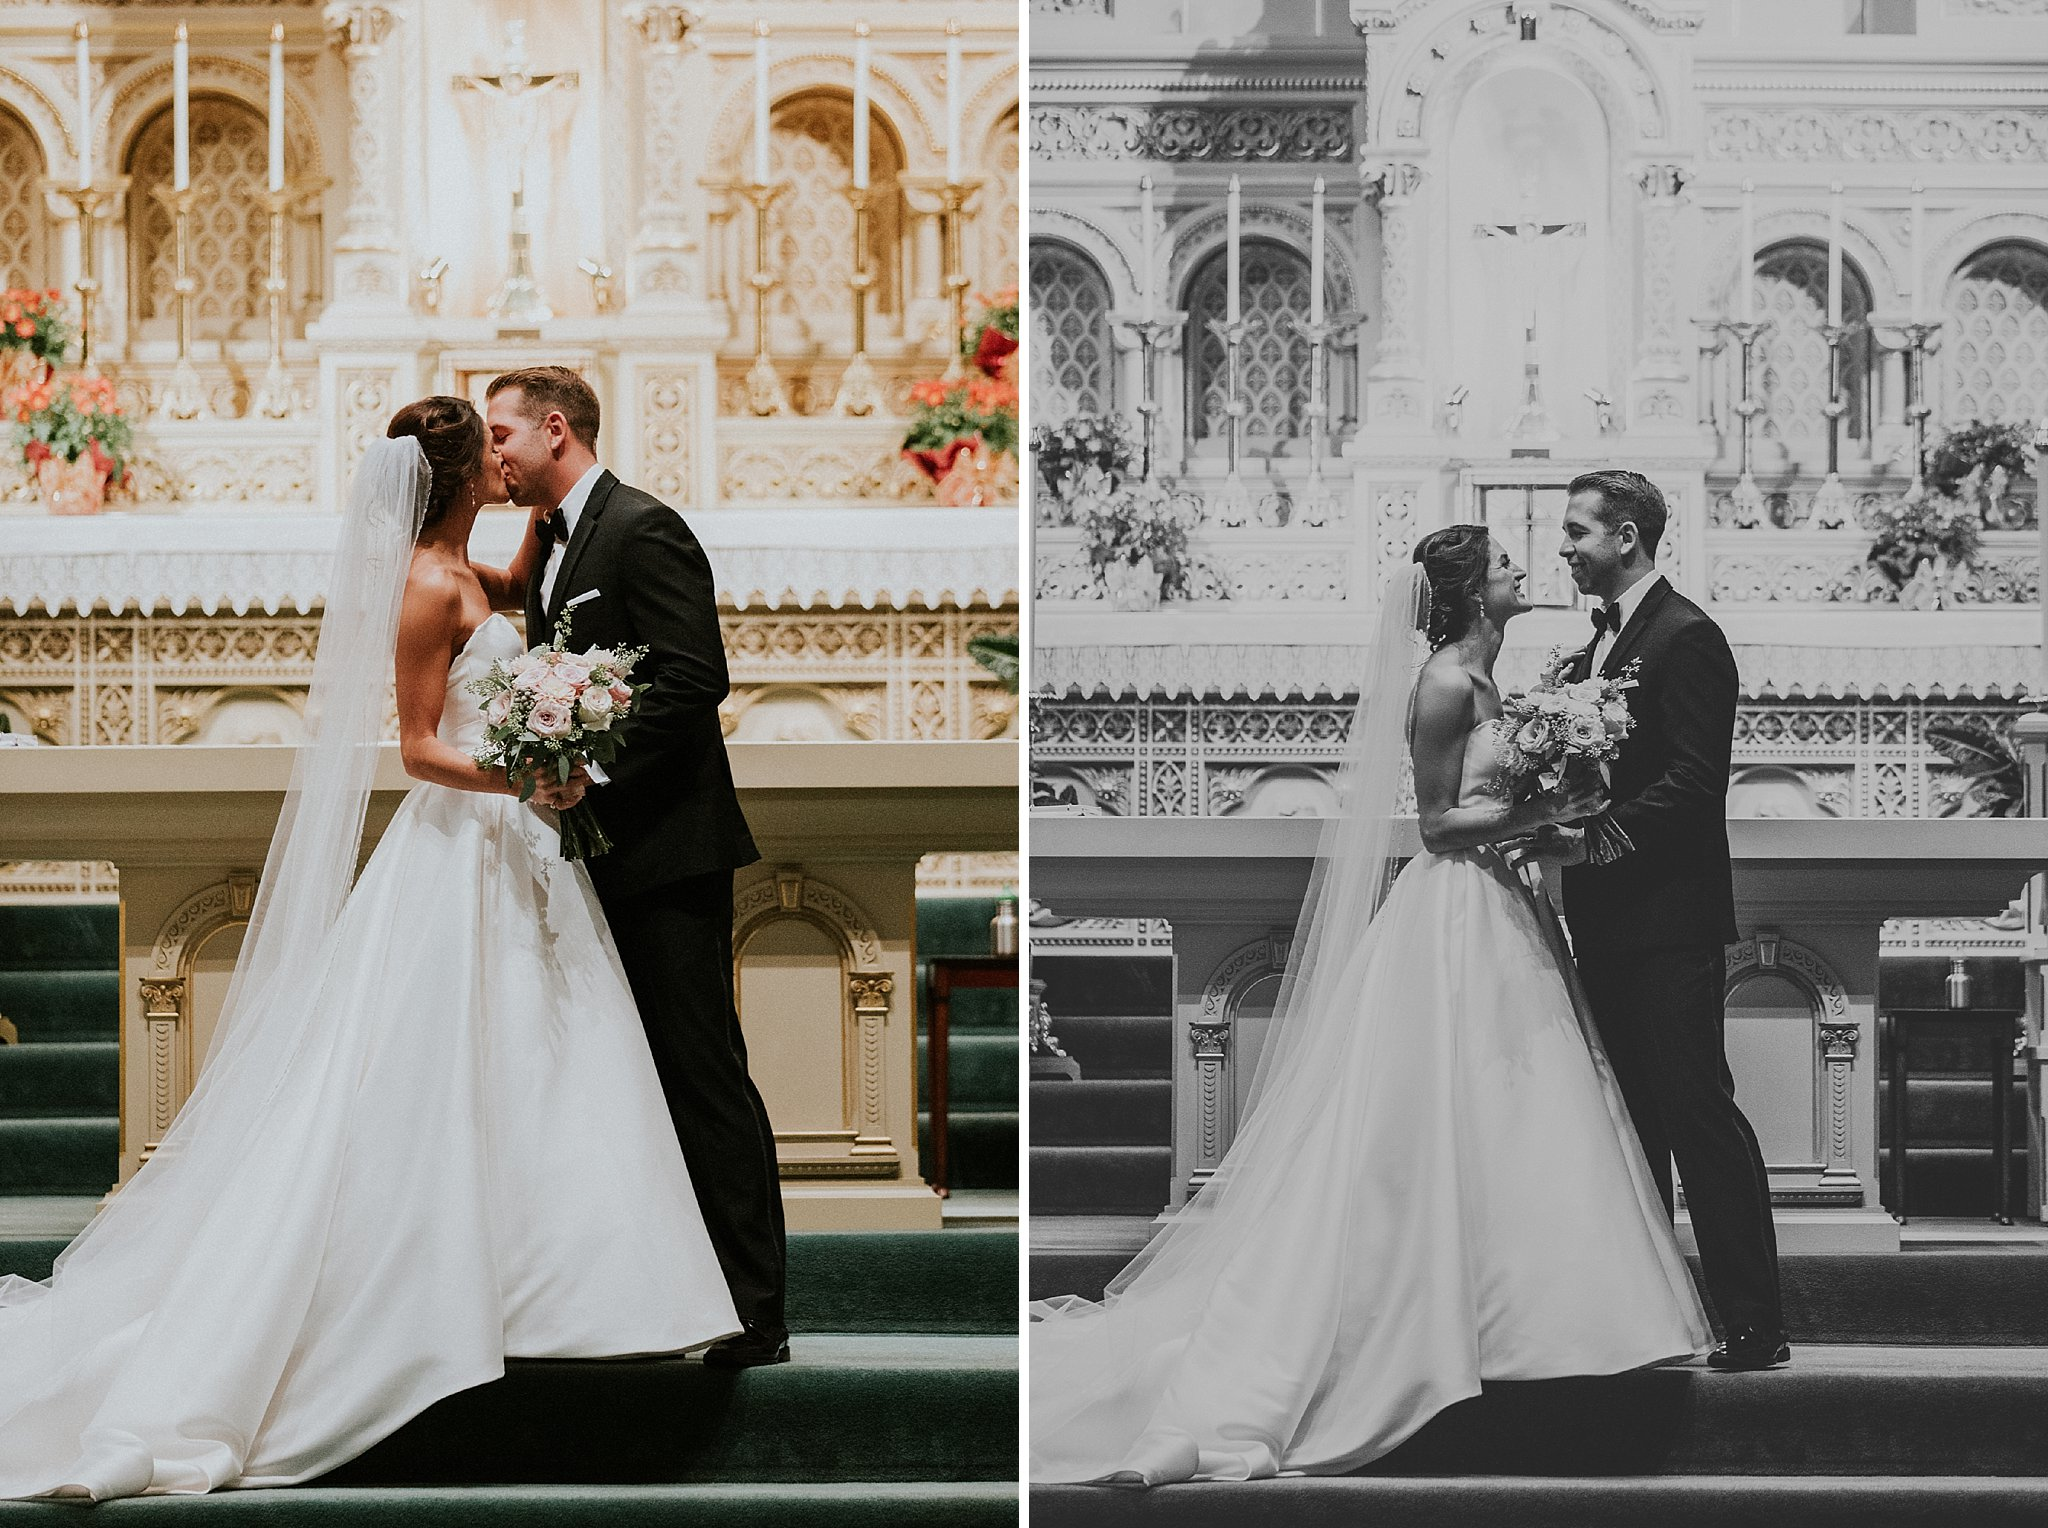 Matt-Lauren_St-Marys_Hilton-City-Center-Milwaukee-Wedding_liller-photo_0027.jpg